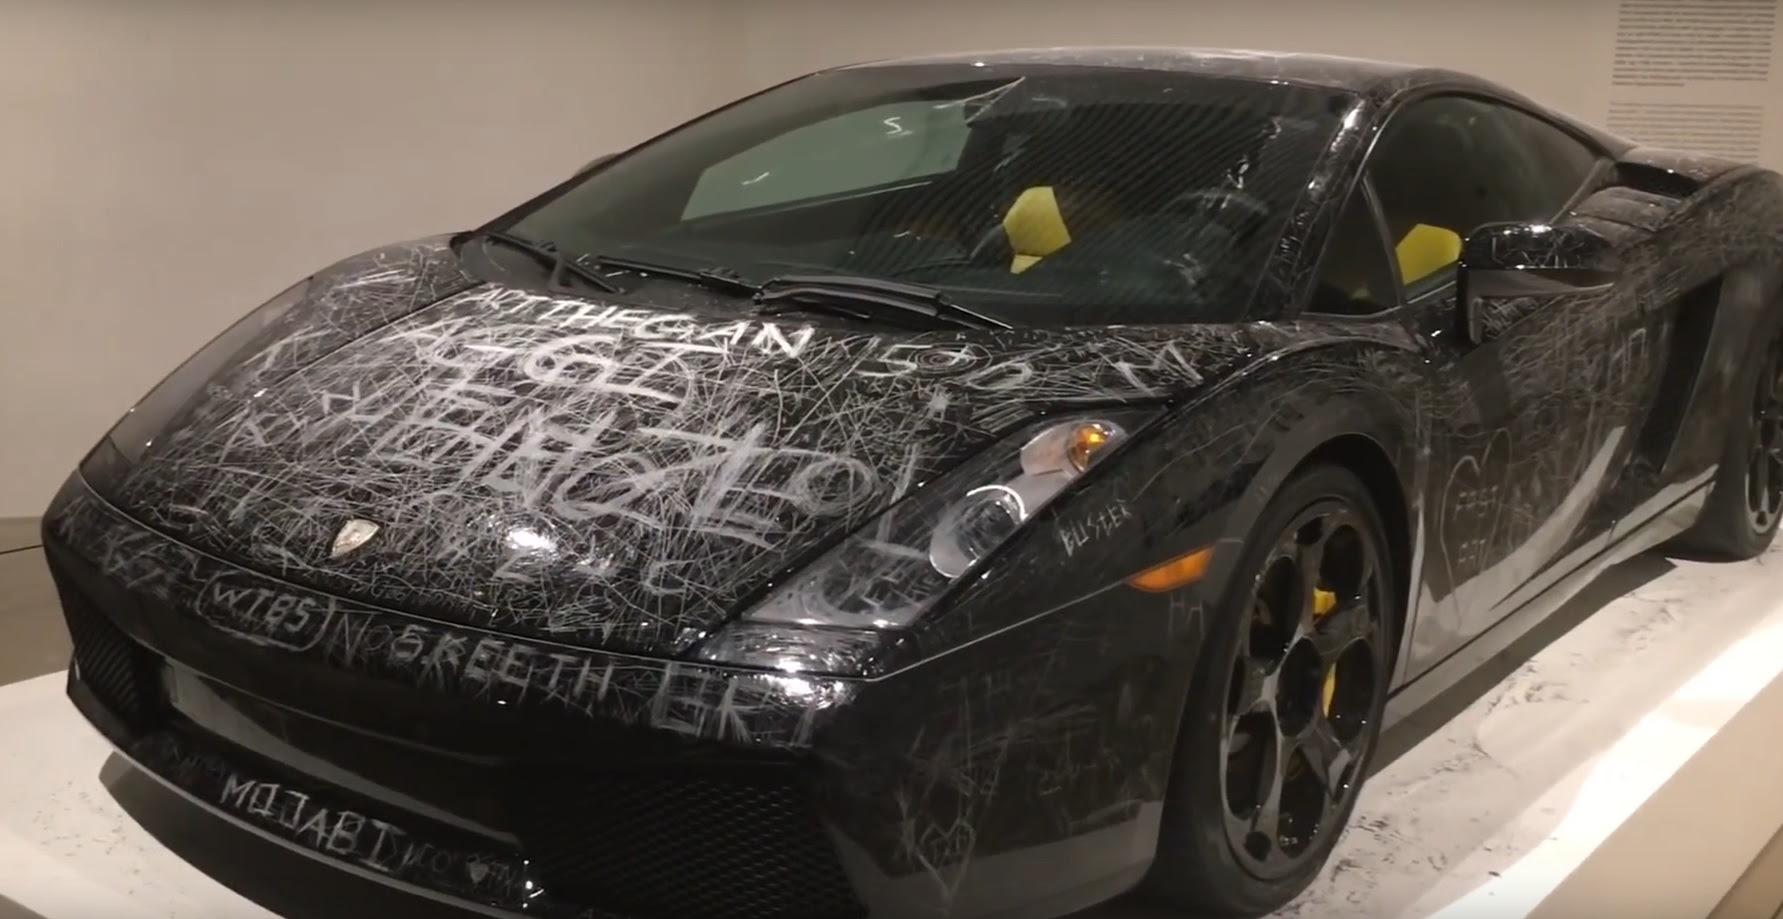 VIDEO: This ScratchedUp Lamborghini Gallardo is Now a